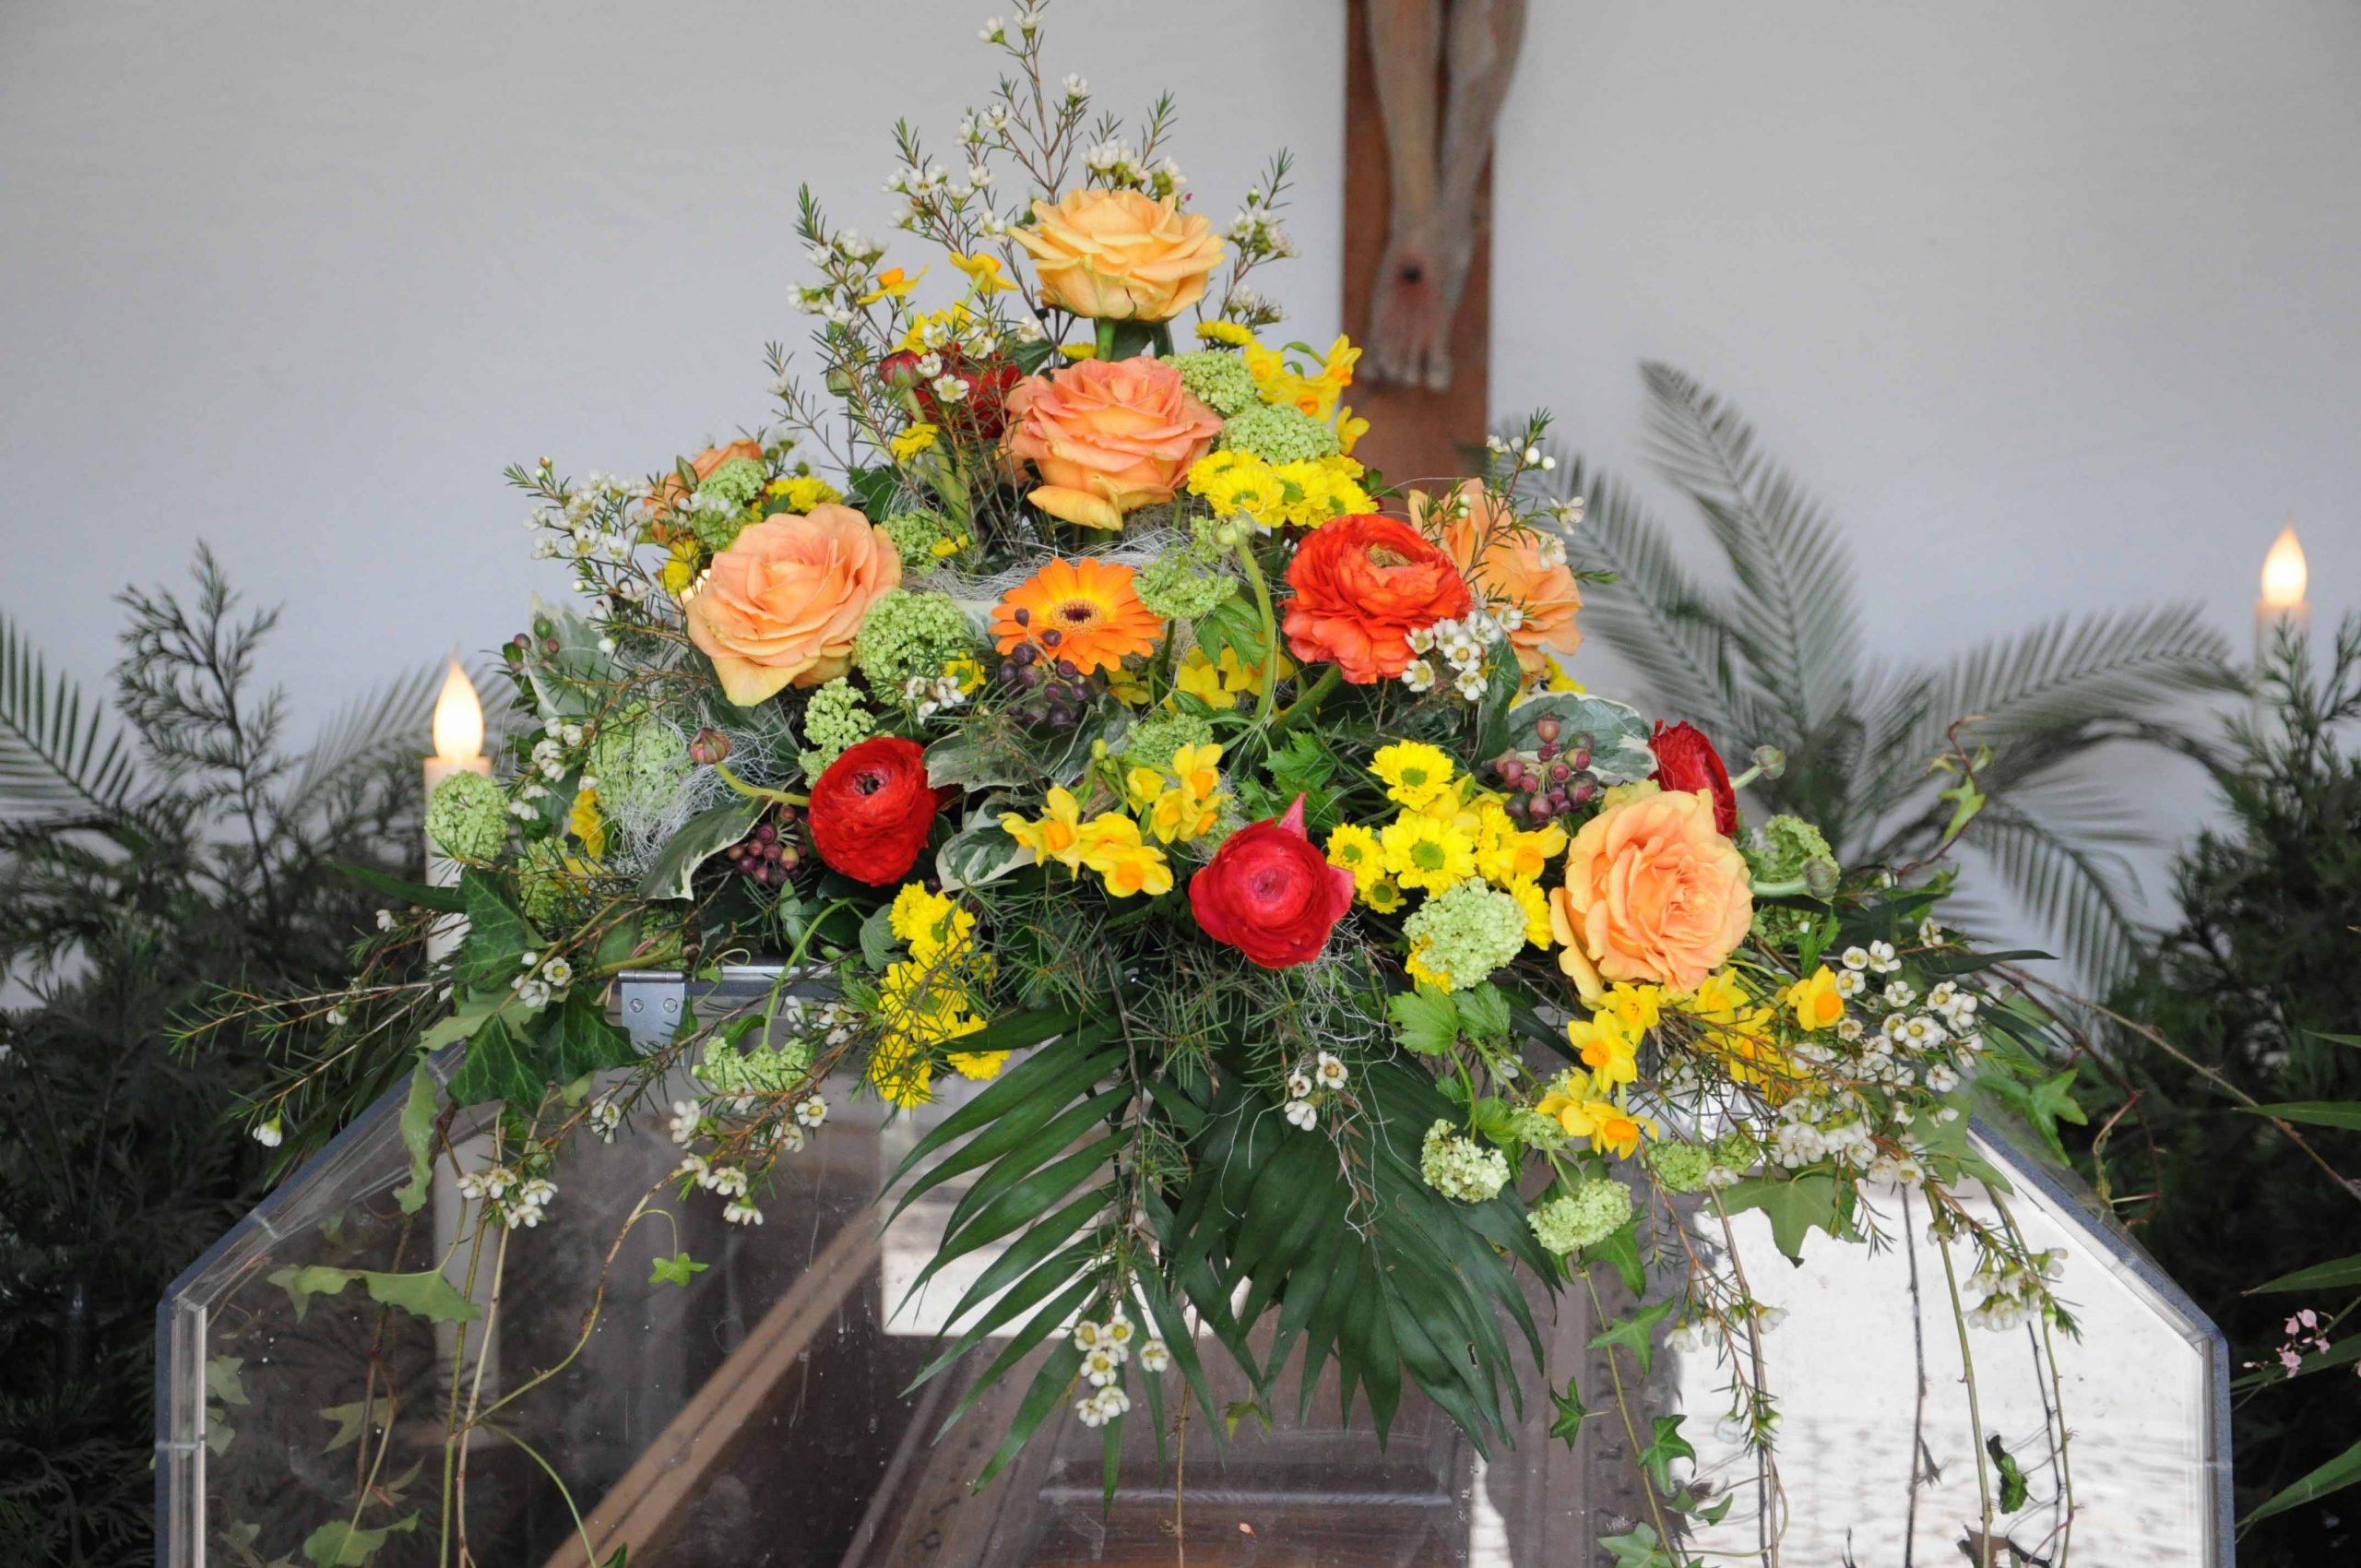 09 Sargbukett gelb-orange